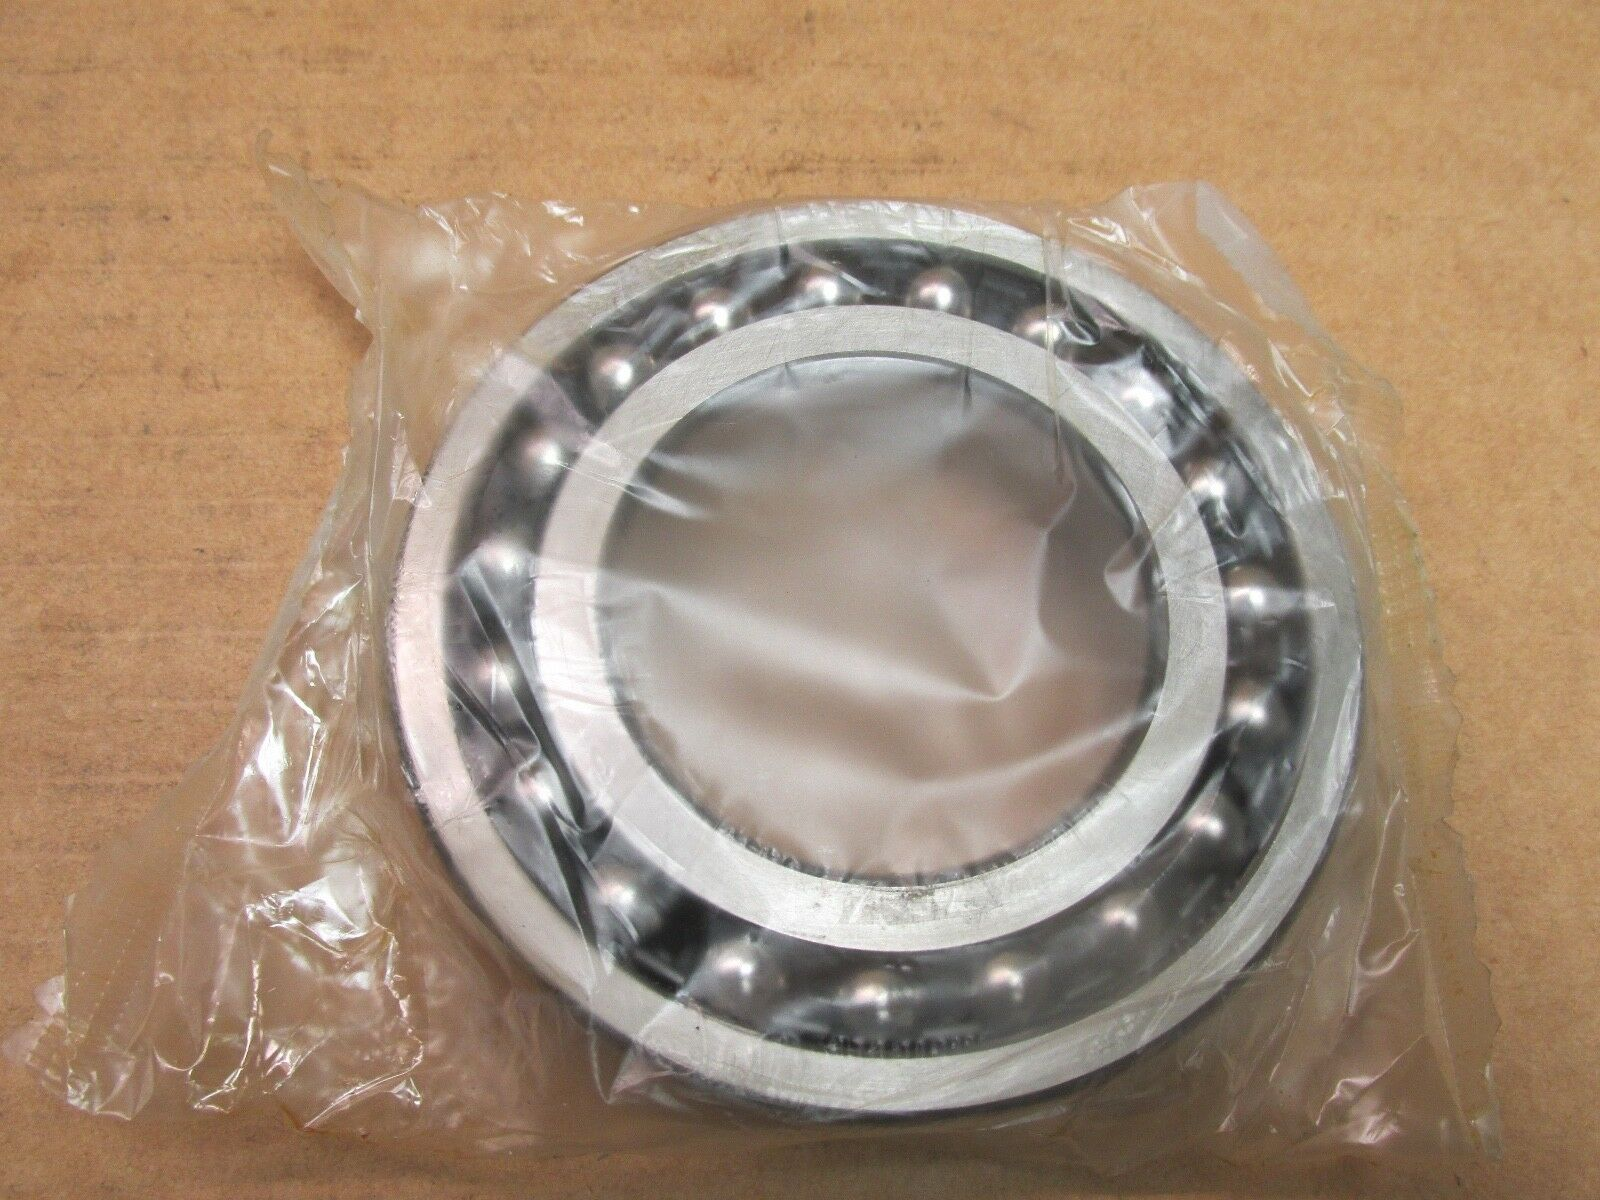 626Z 6mm x 19mm x6mm Shielded Radial Miniature Deep Groove Ball Bearing 5 pcs LW